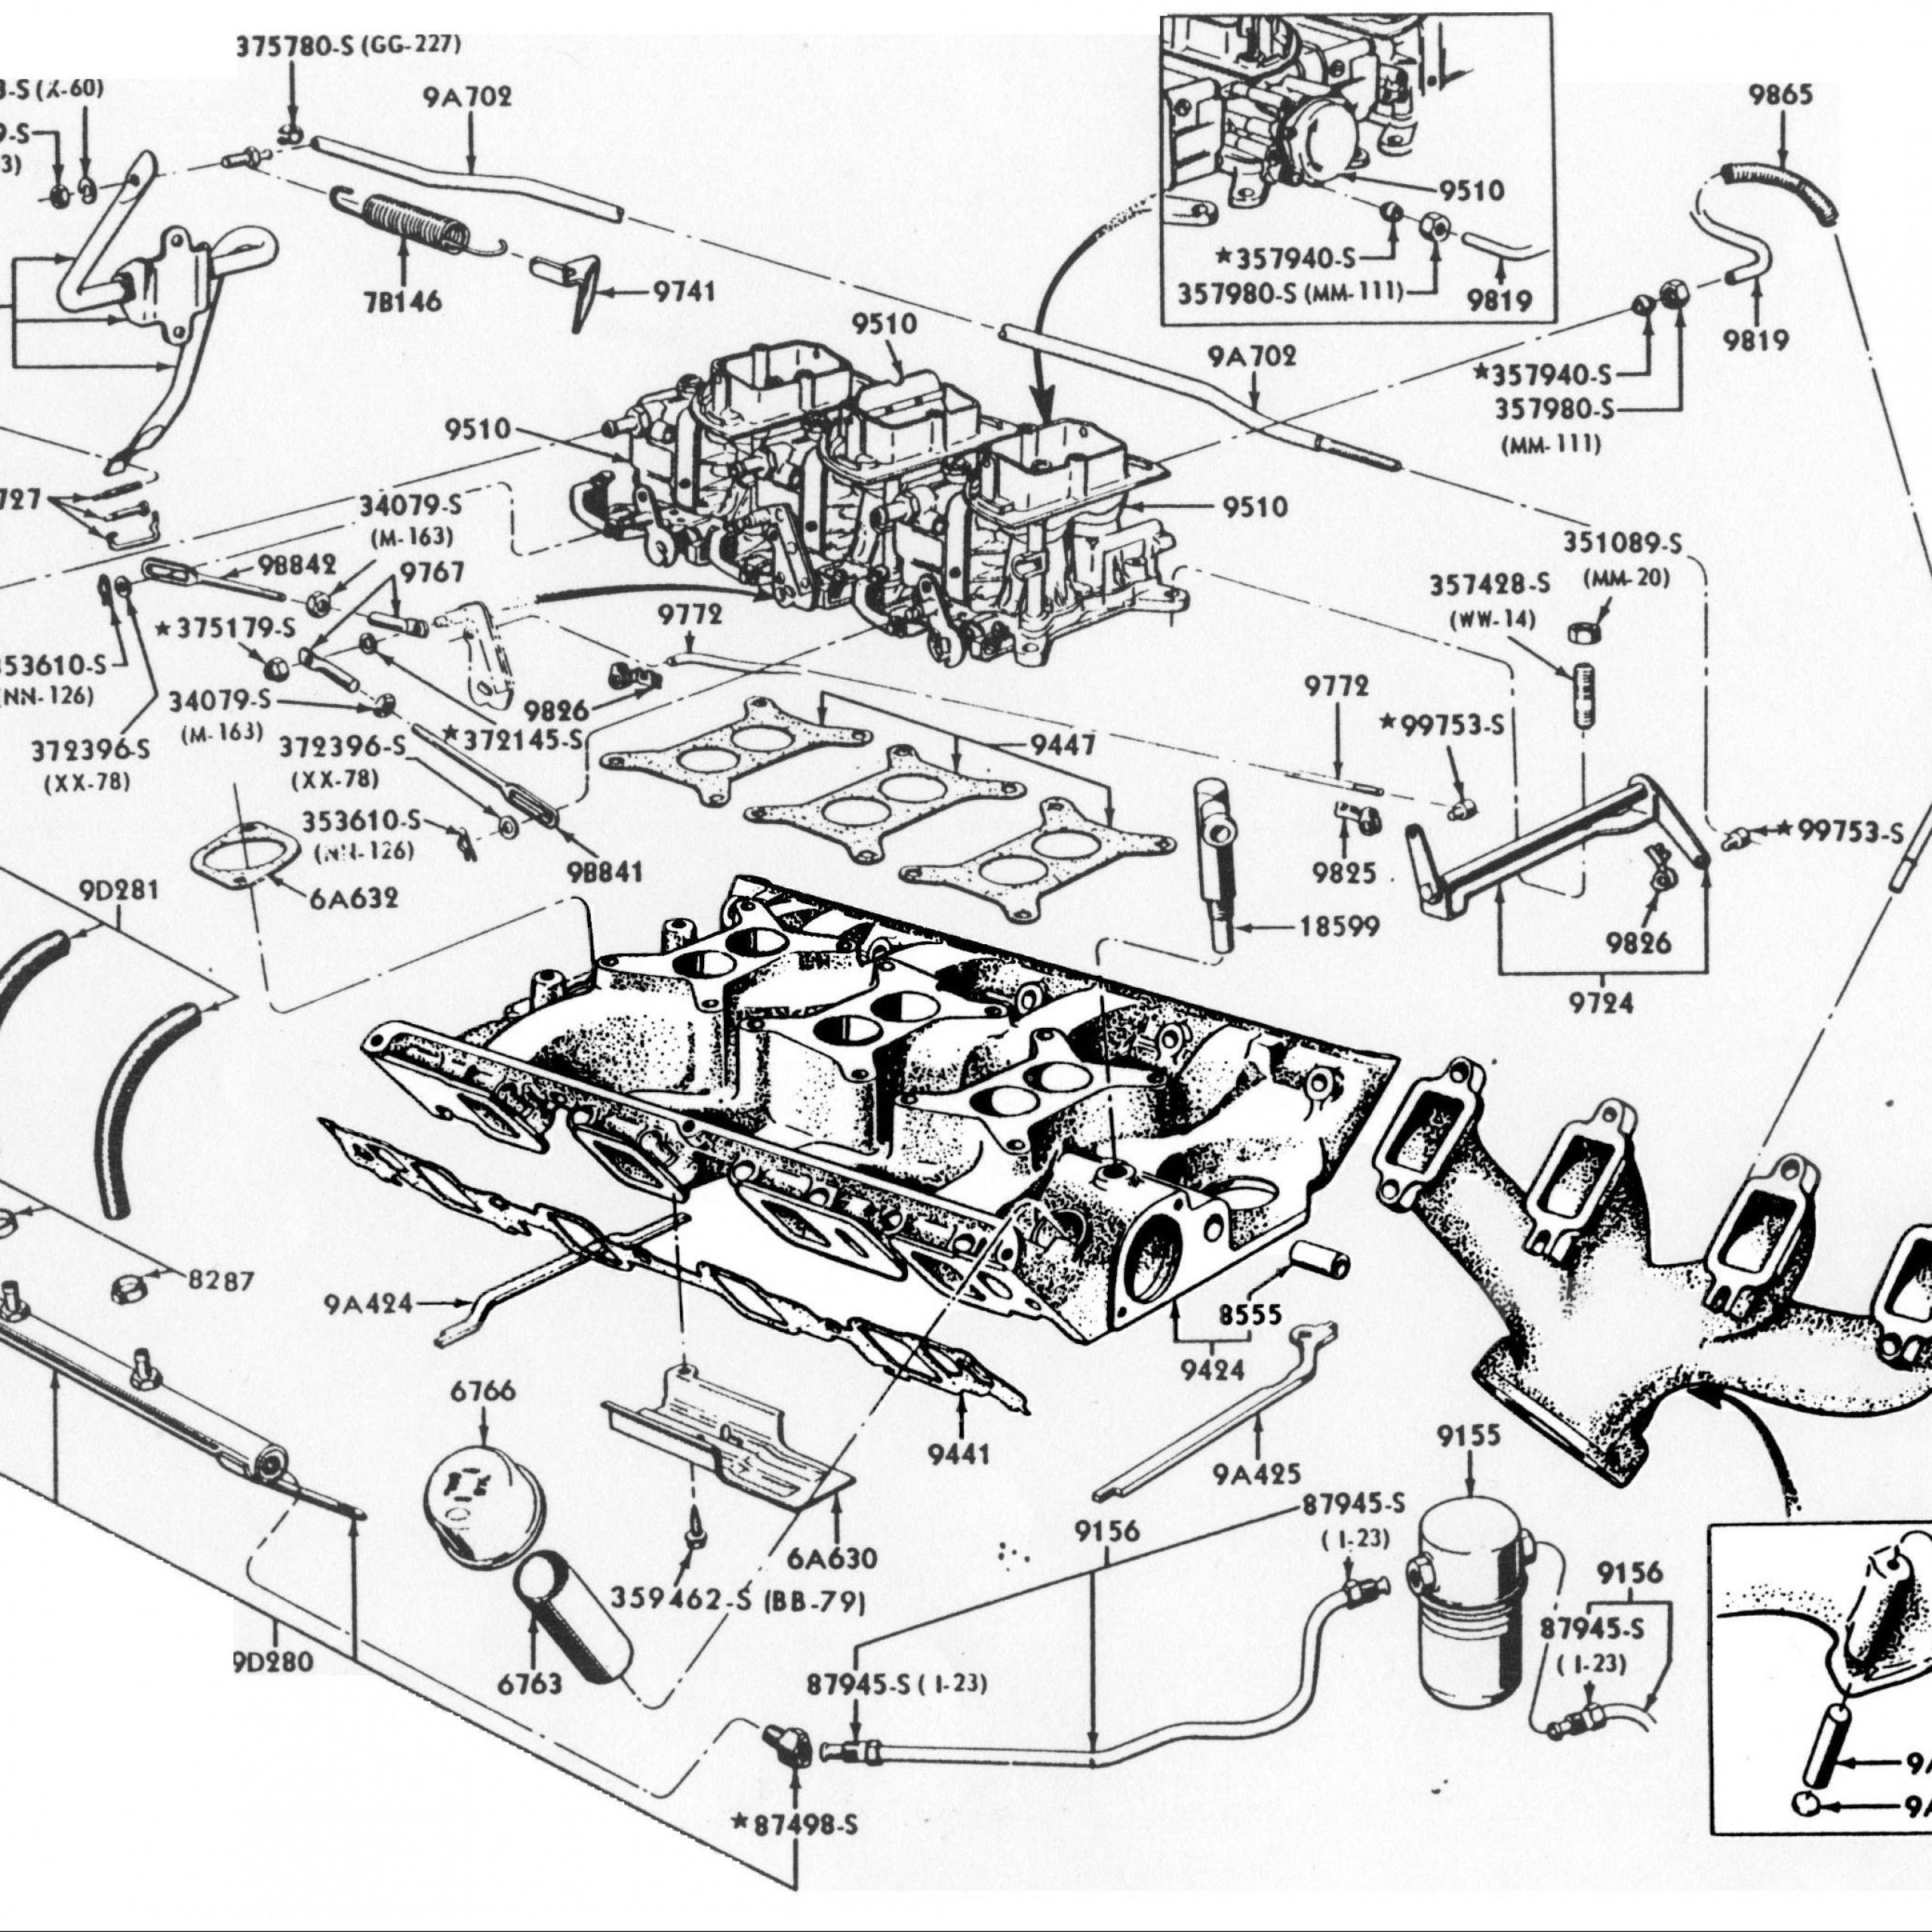 Diagram] Ford F 250 460 Engine Diagram Full Version Hd